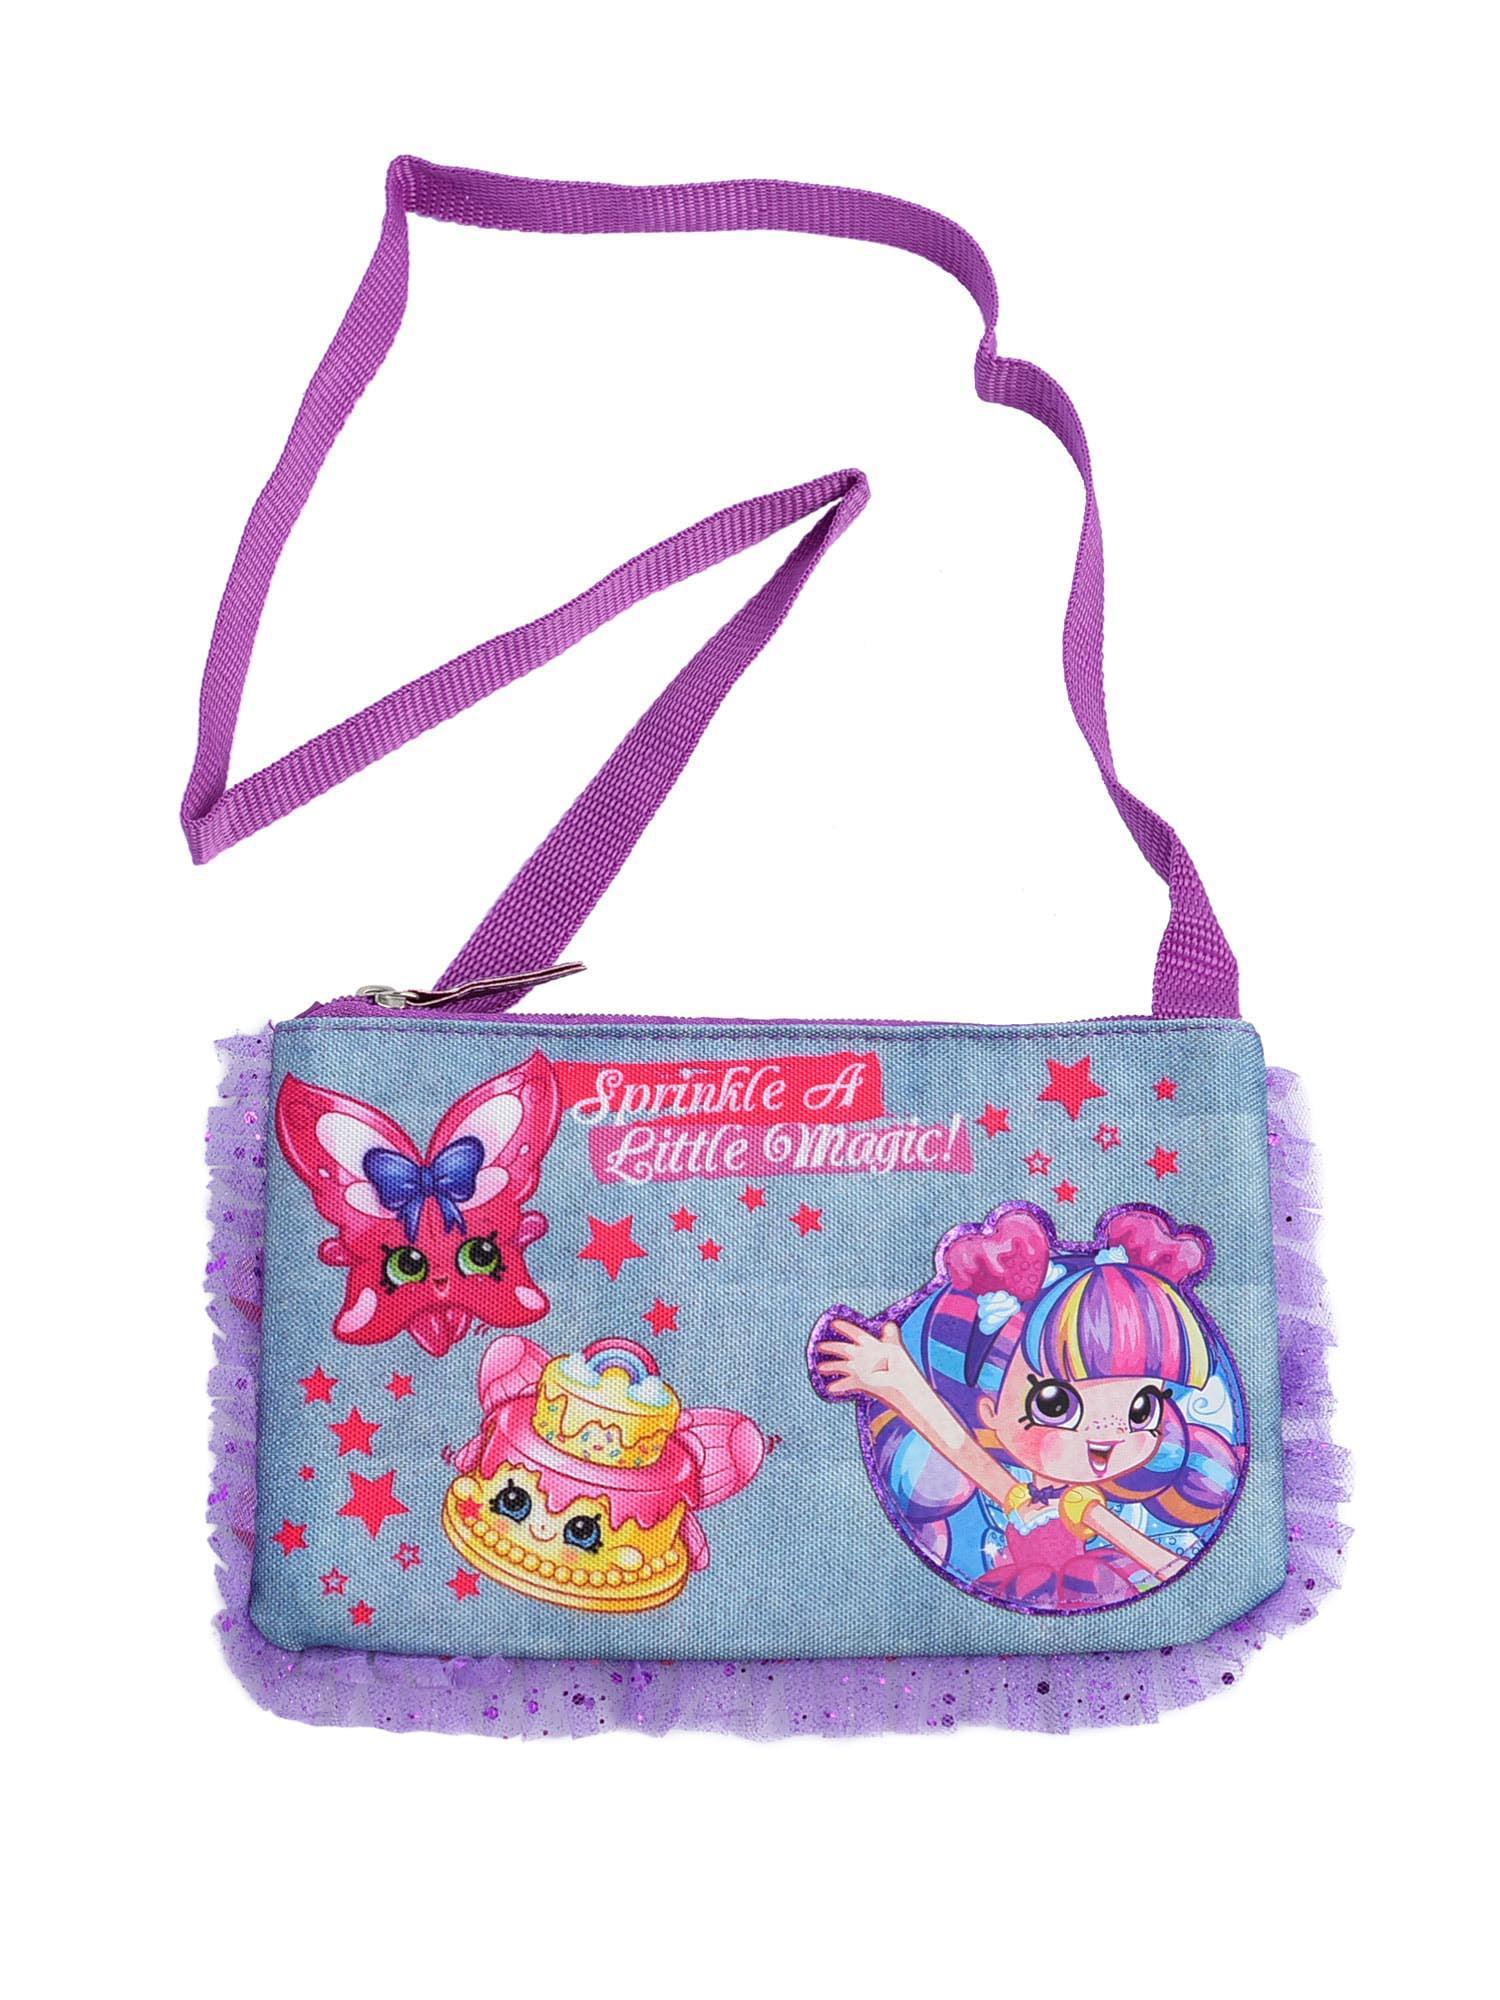 Girls Shopkins Shoppies Cross Body Zippered Handbag Sprinkle A Little Magic